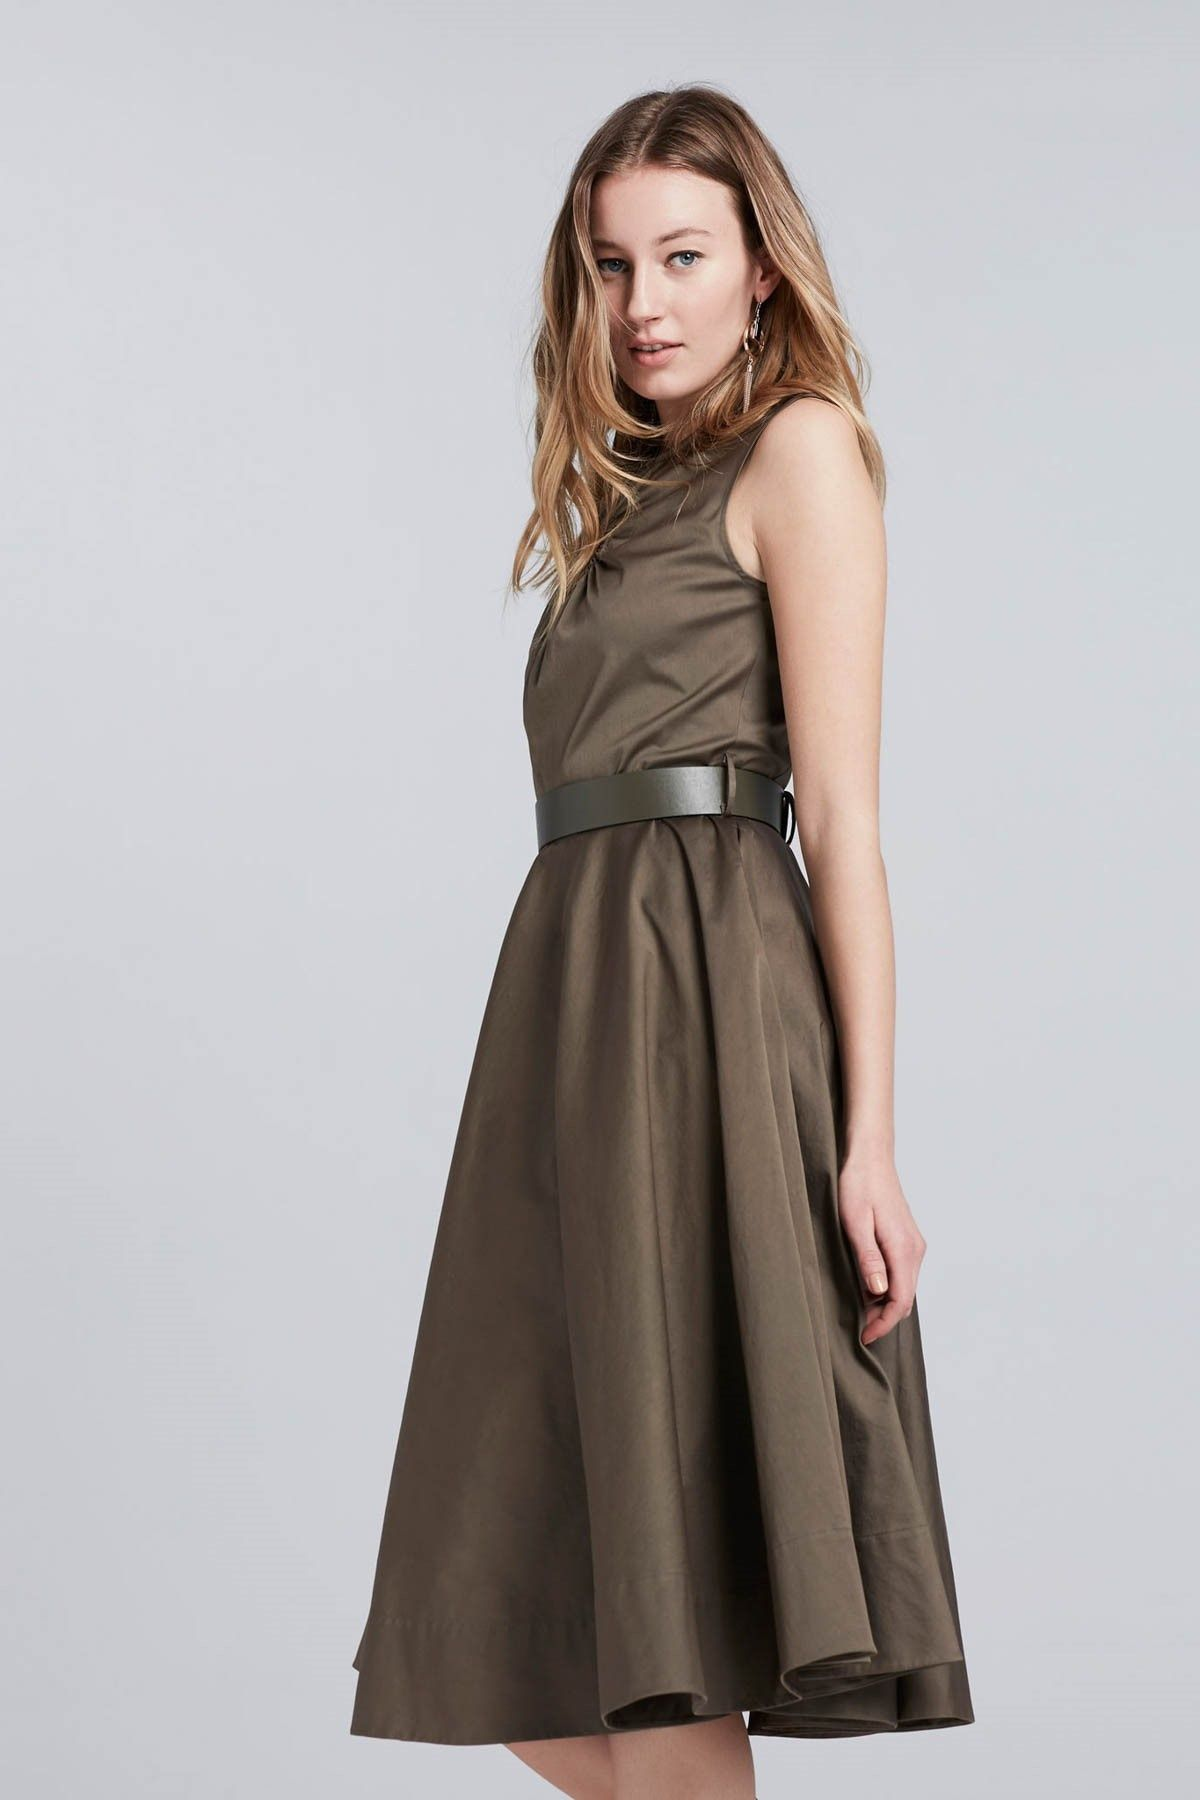 Kadin Haki Elbise Ipekyol Trendyol Elbise Giyim The Dress